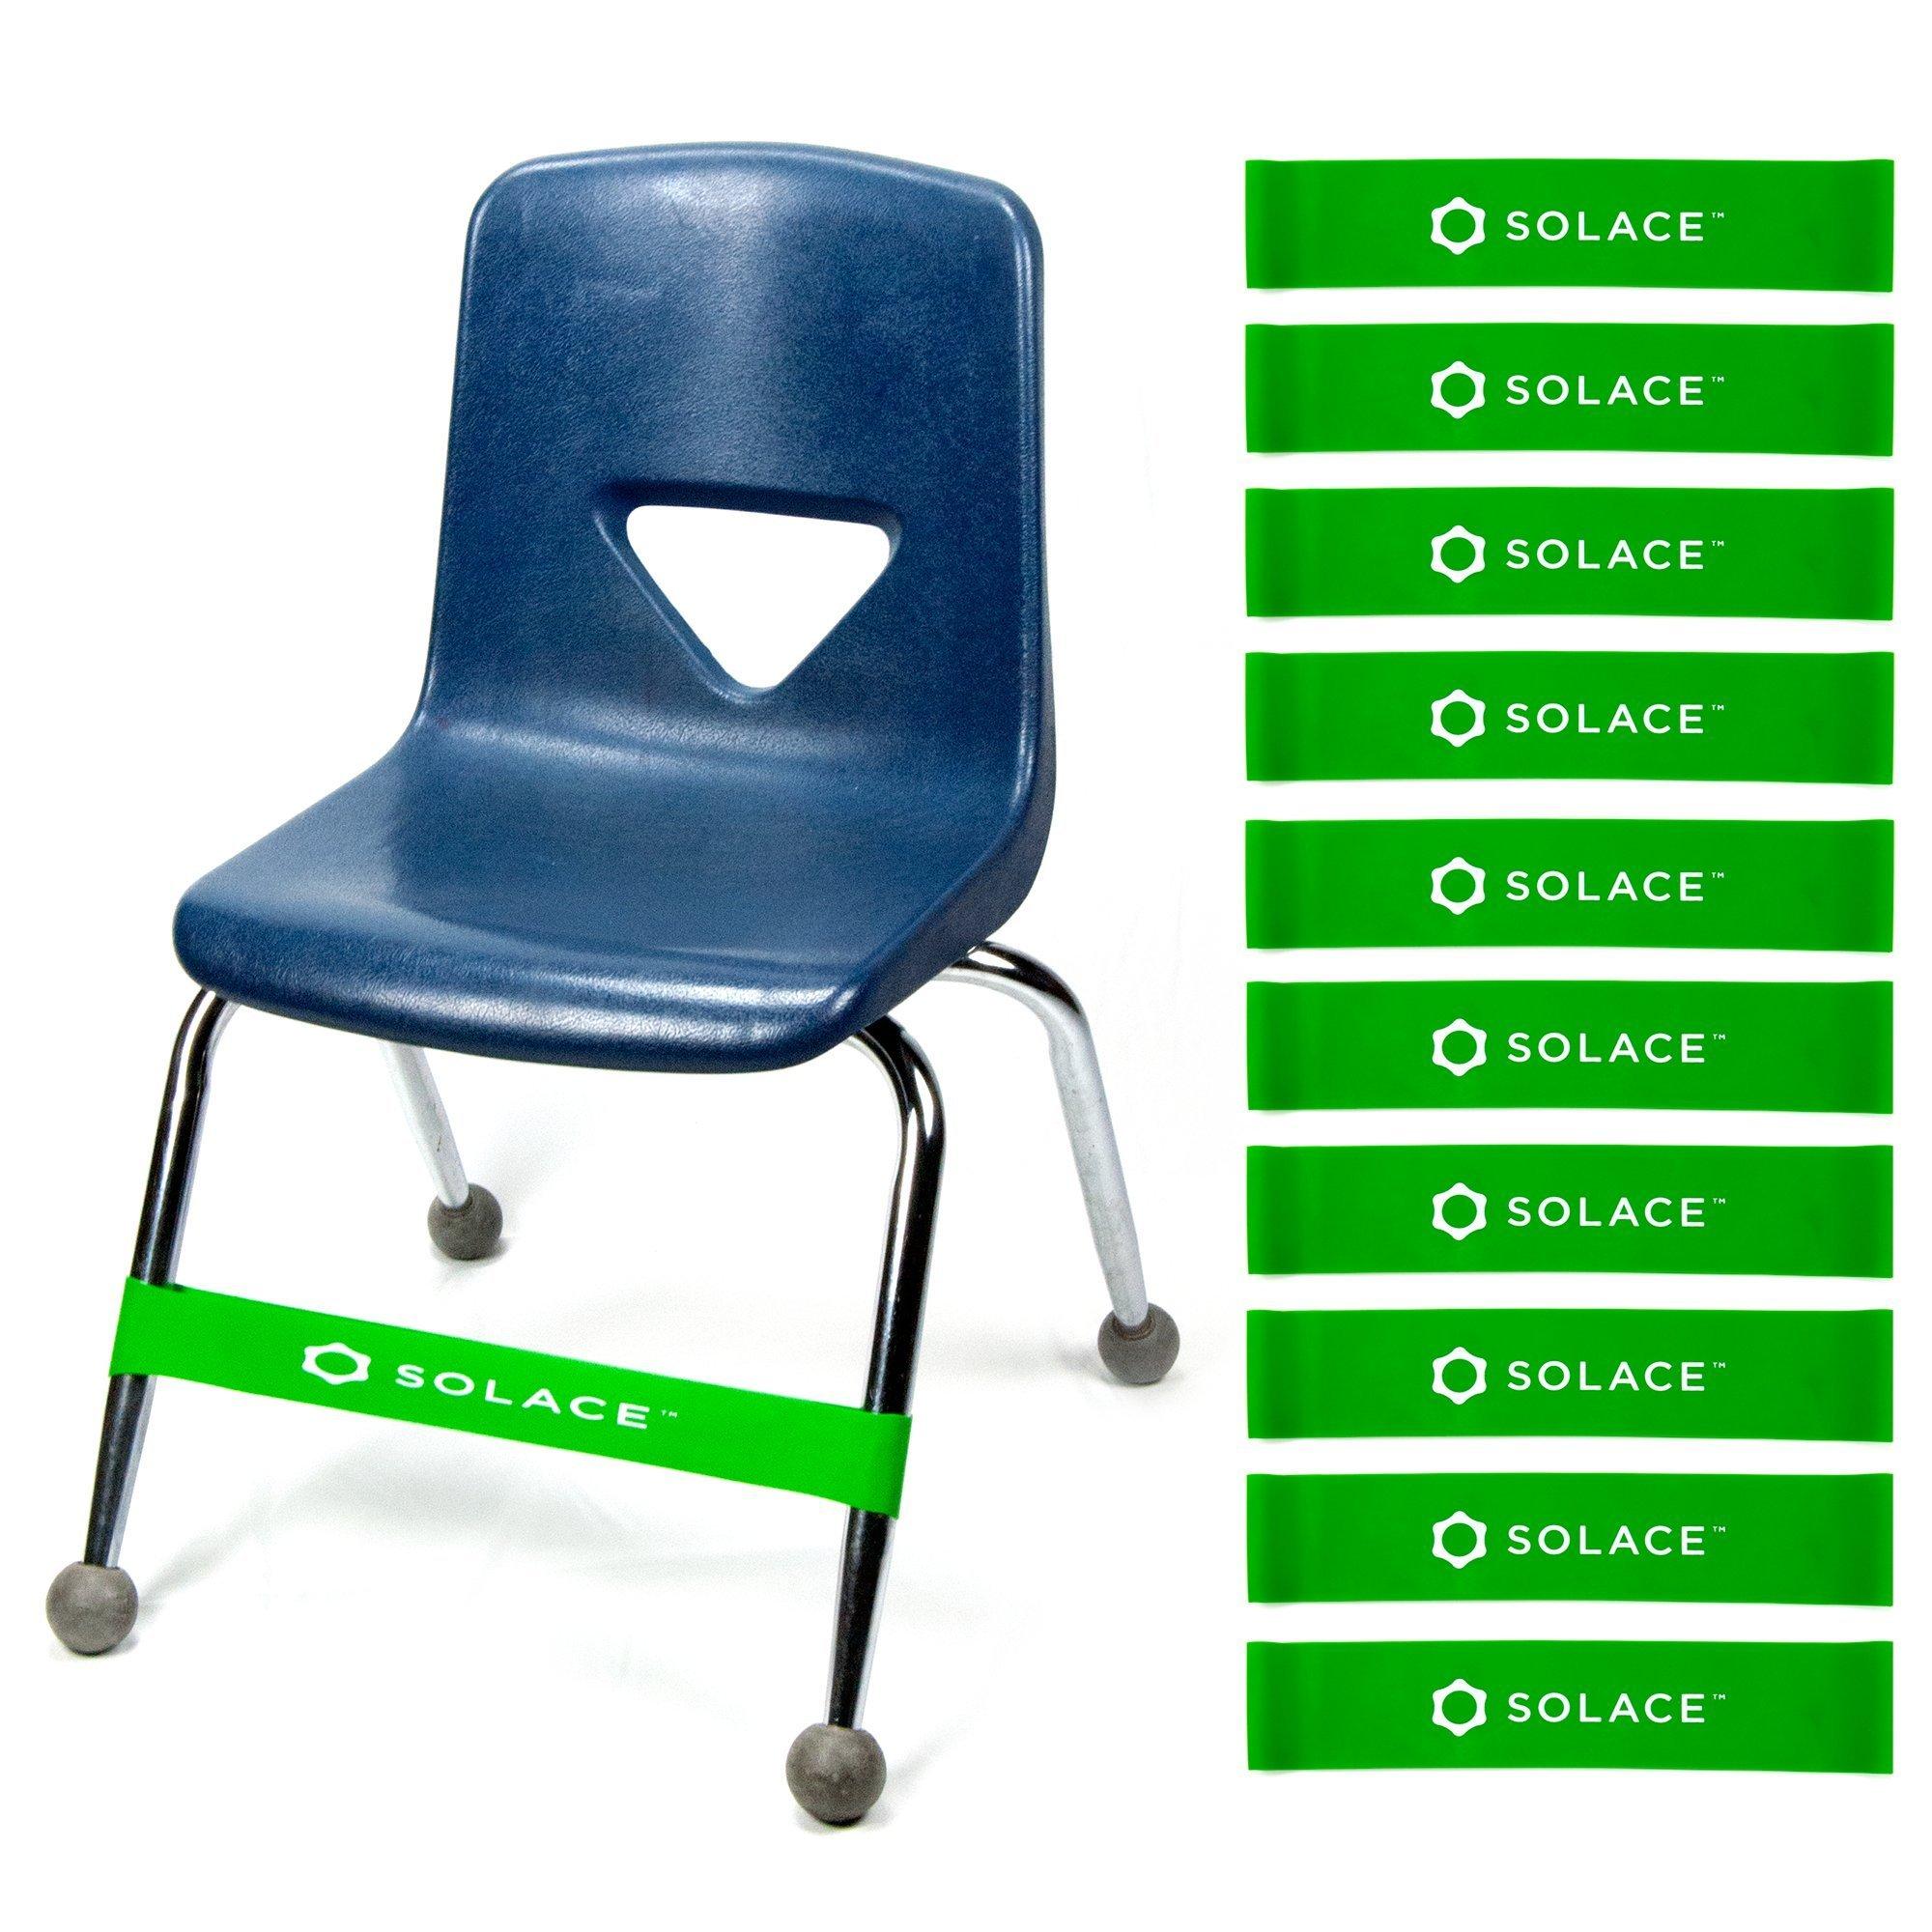 Astonishing Details About Kick Bands Bouncy Chair Fidget Bands 10 Pack Improves Focus For School Kids Short Links Chair Design For Home Short Linksinfo